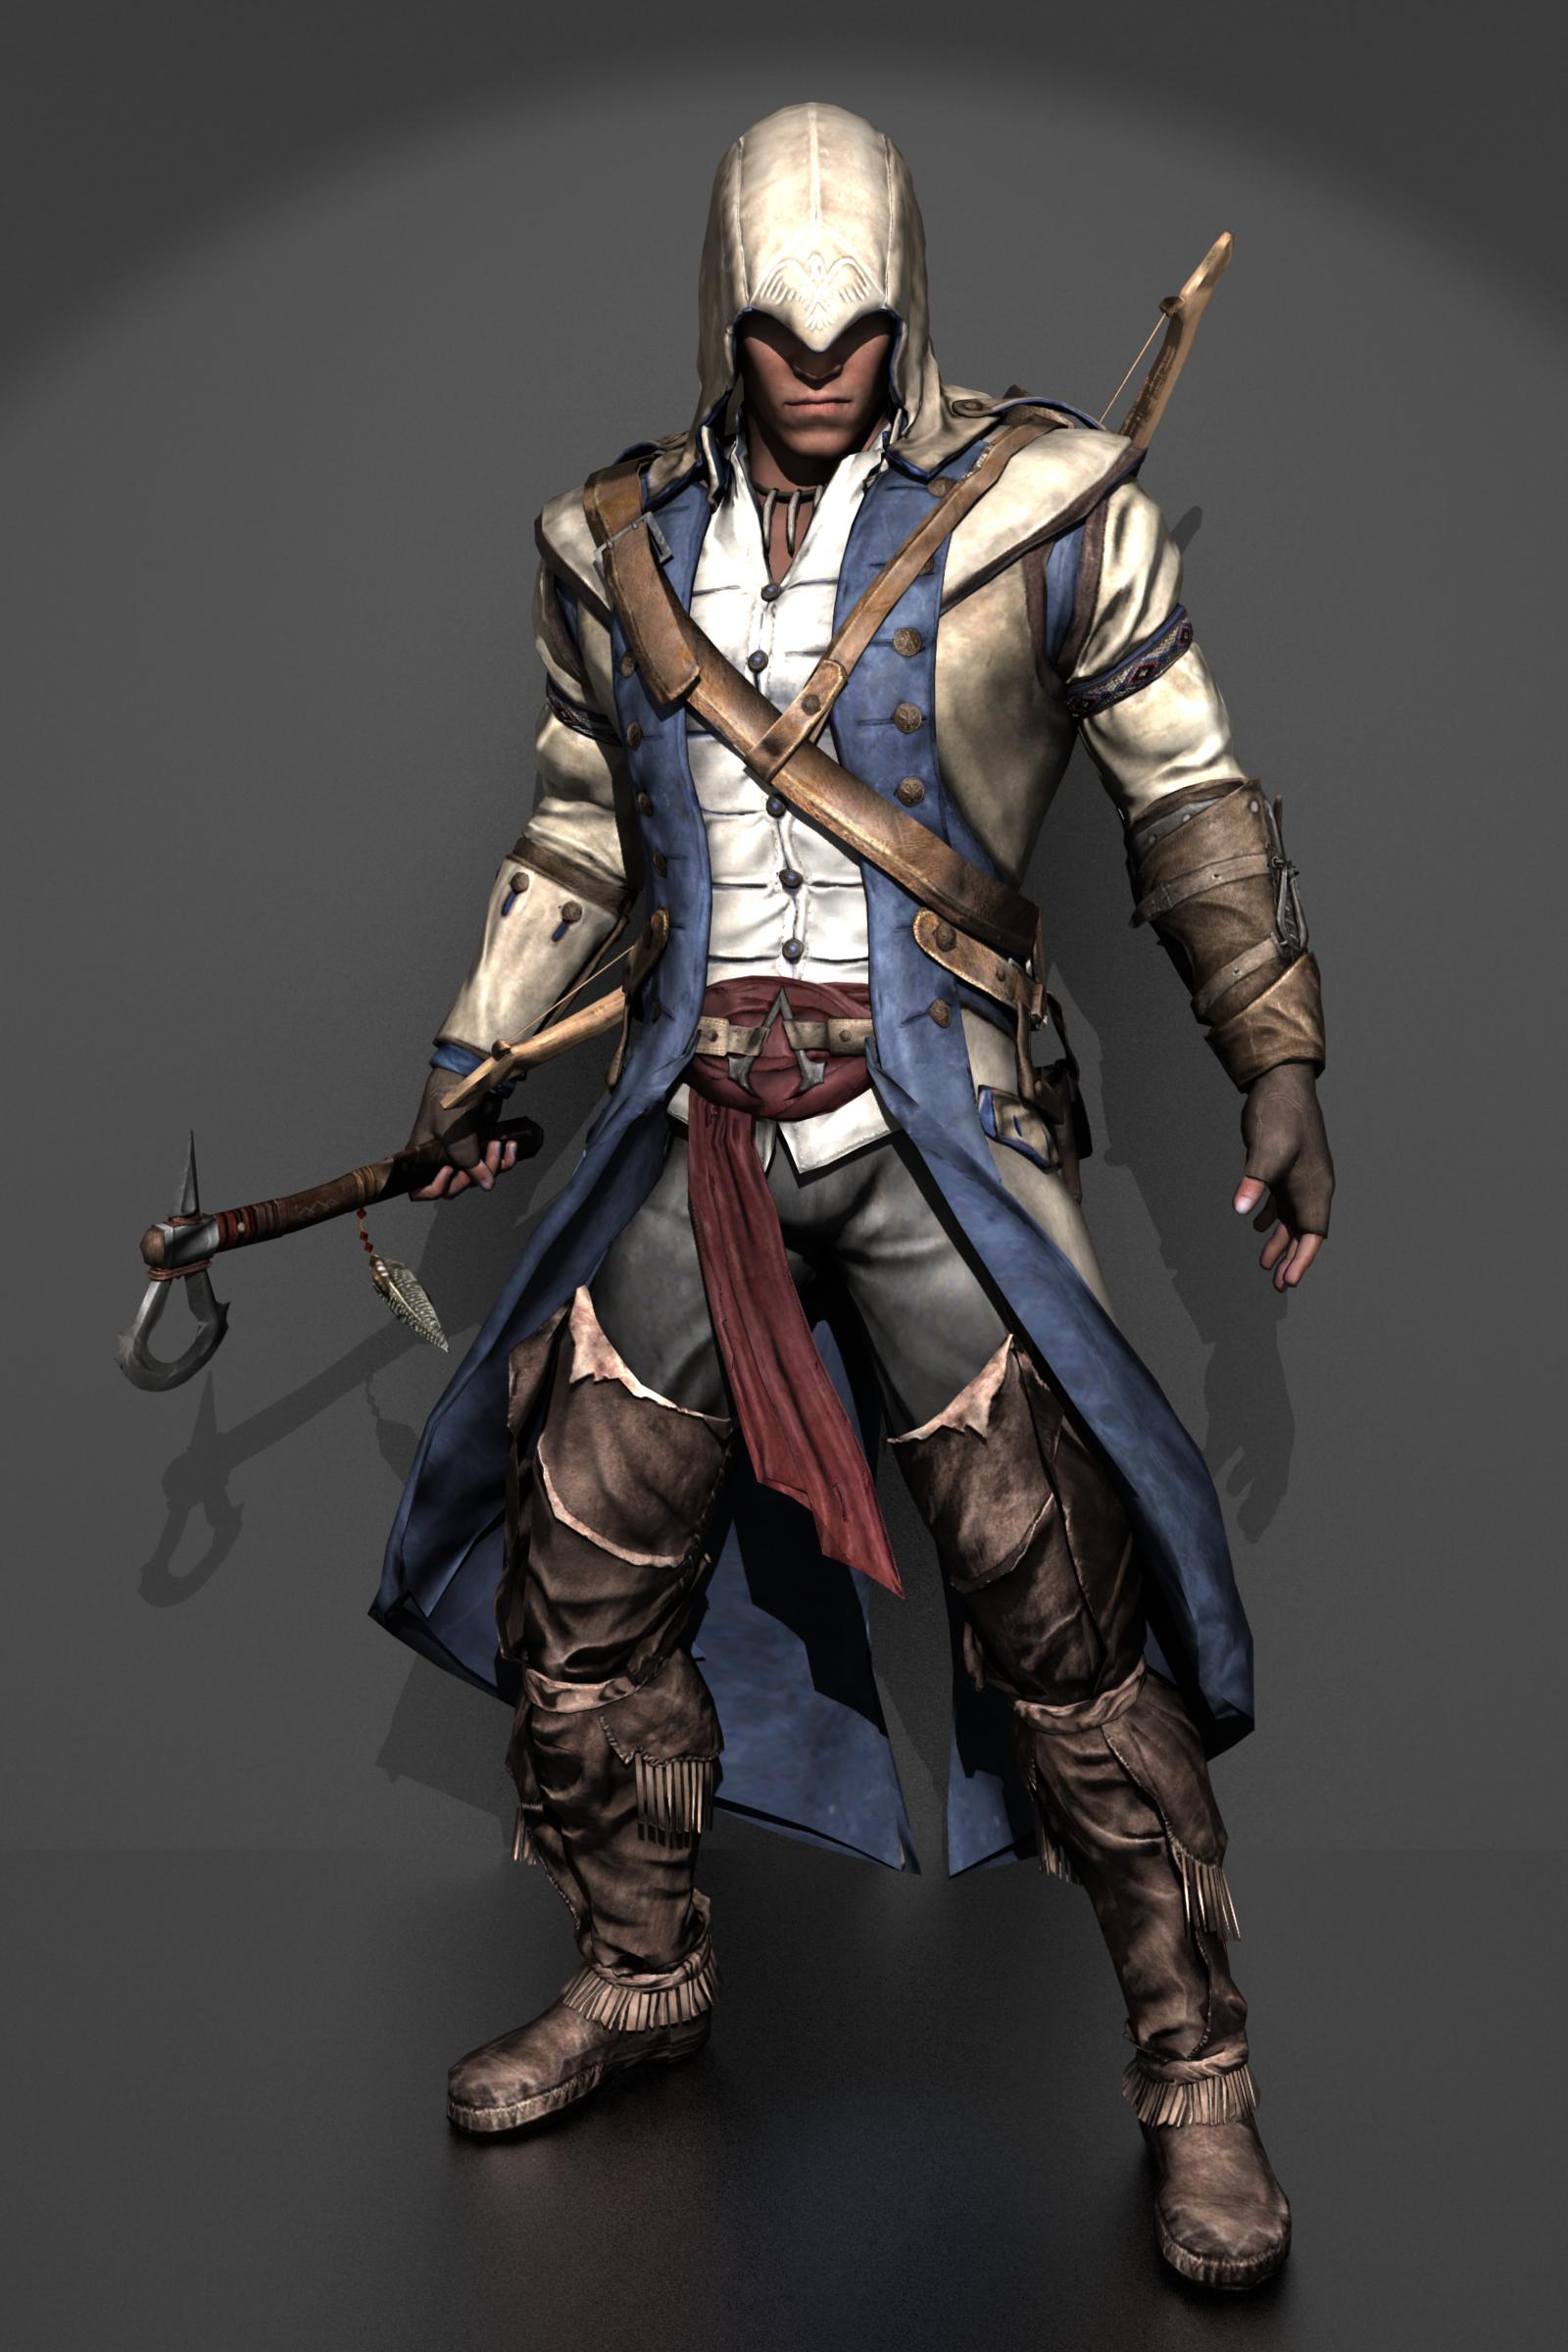 Assassin S Creed 3 Connor Kenway By Ishikahiruma On Deviantart